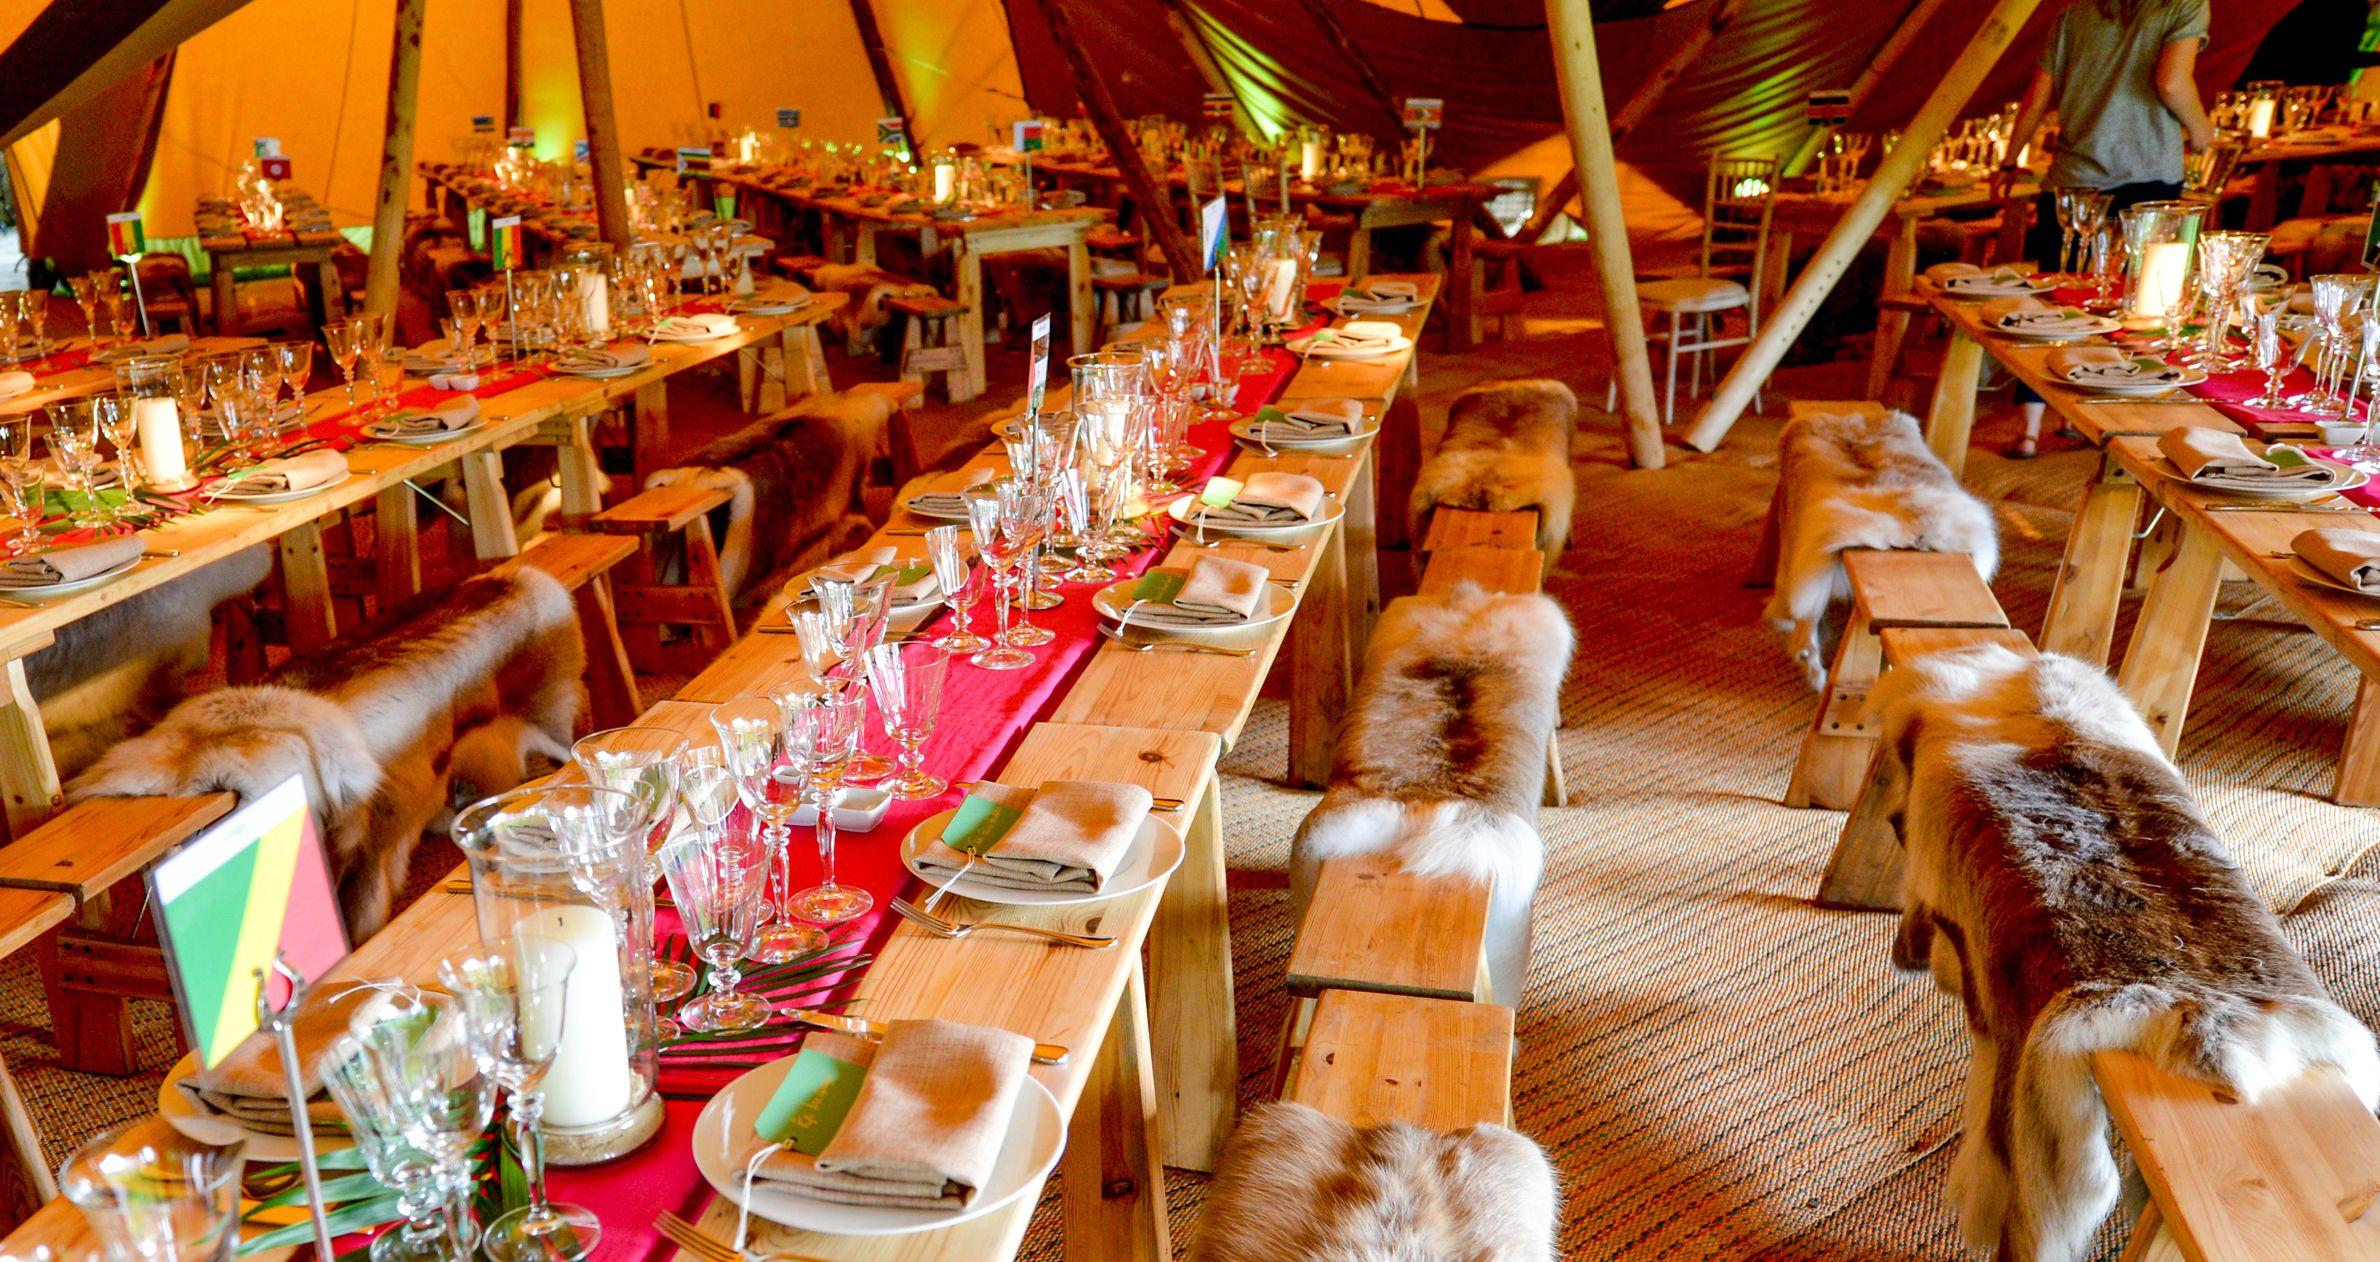 african themed banquet google search chs choir is wild banquet 2016 pinterest banquet. Black Bedroom Furniture Sets. Home Design Ideas